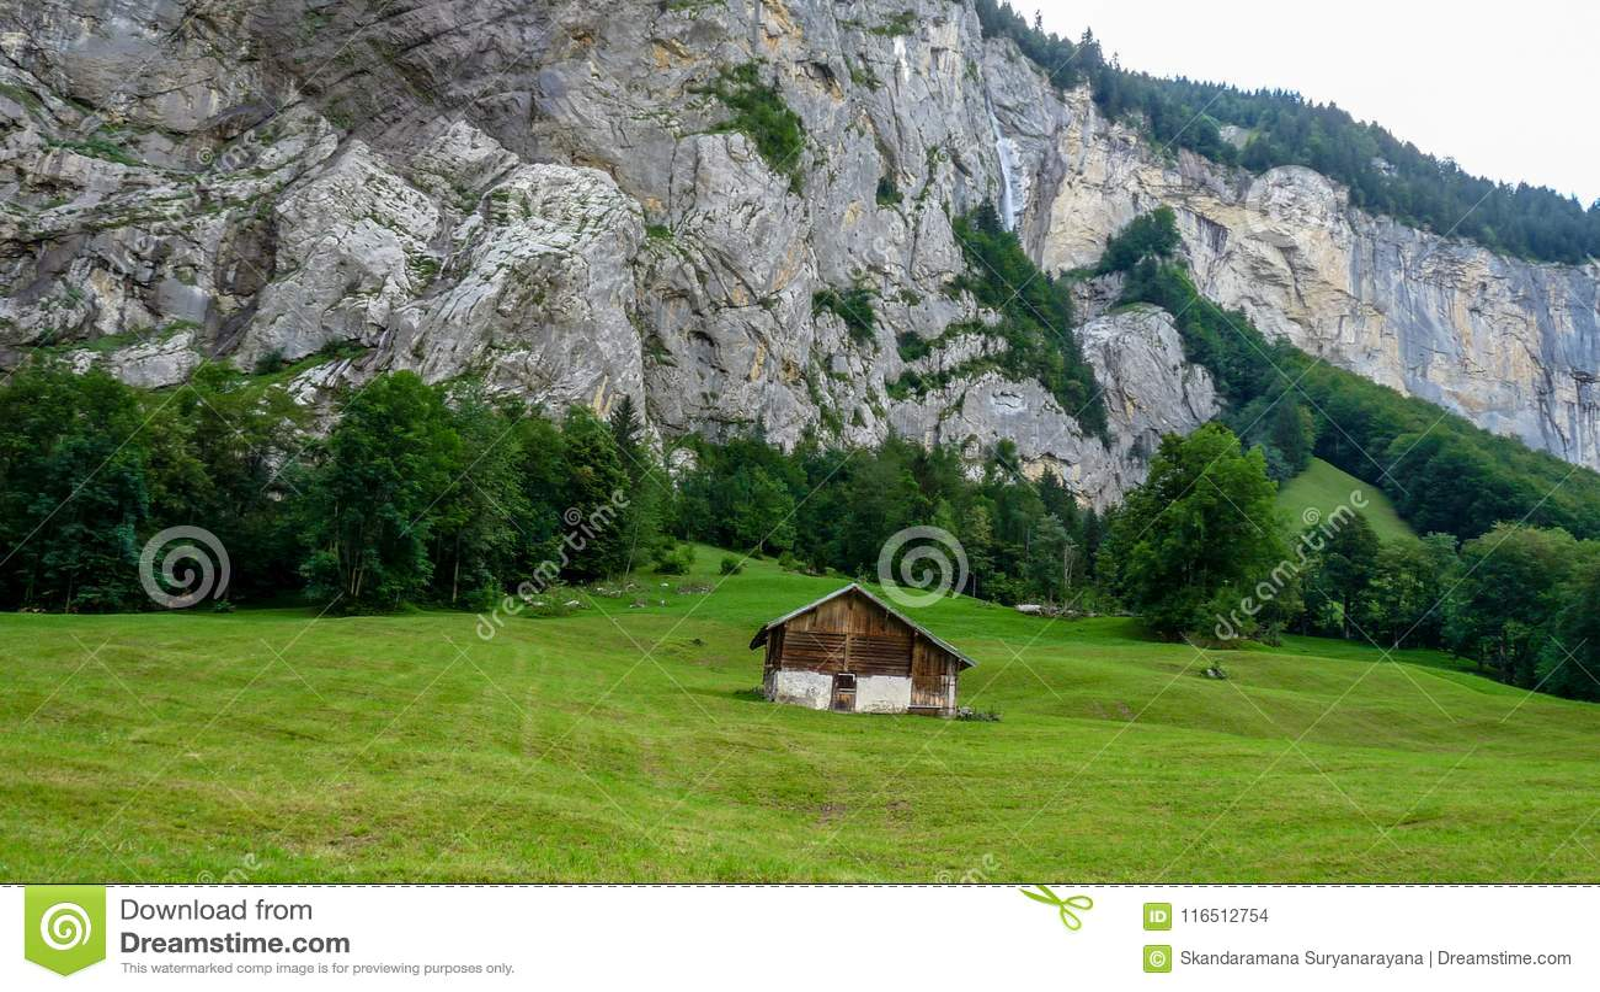 Schweiz Lauterbrunnen, BYGGD STRUKTUR PÅ FÄLT MOT MOU